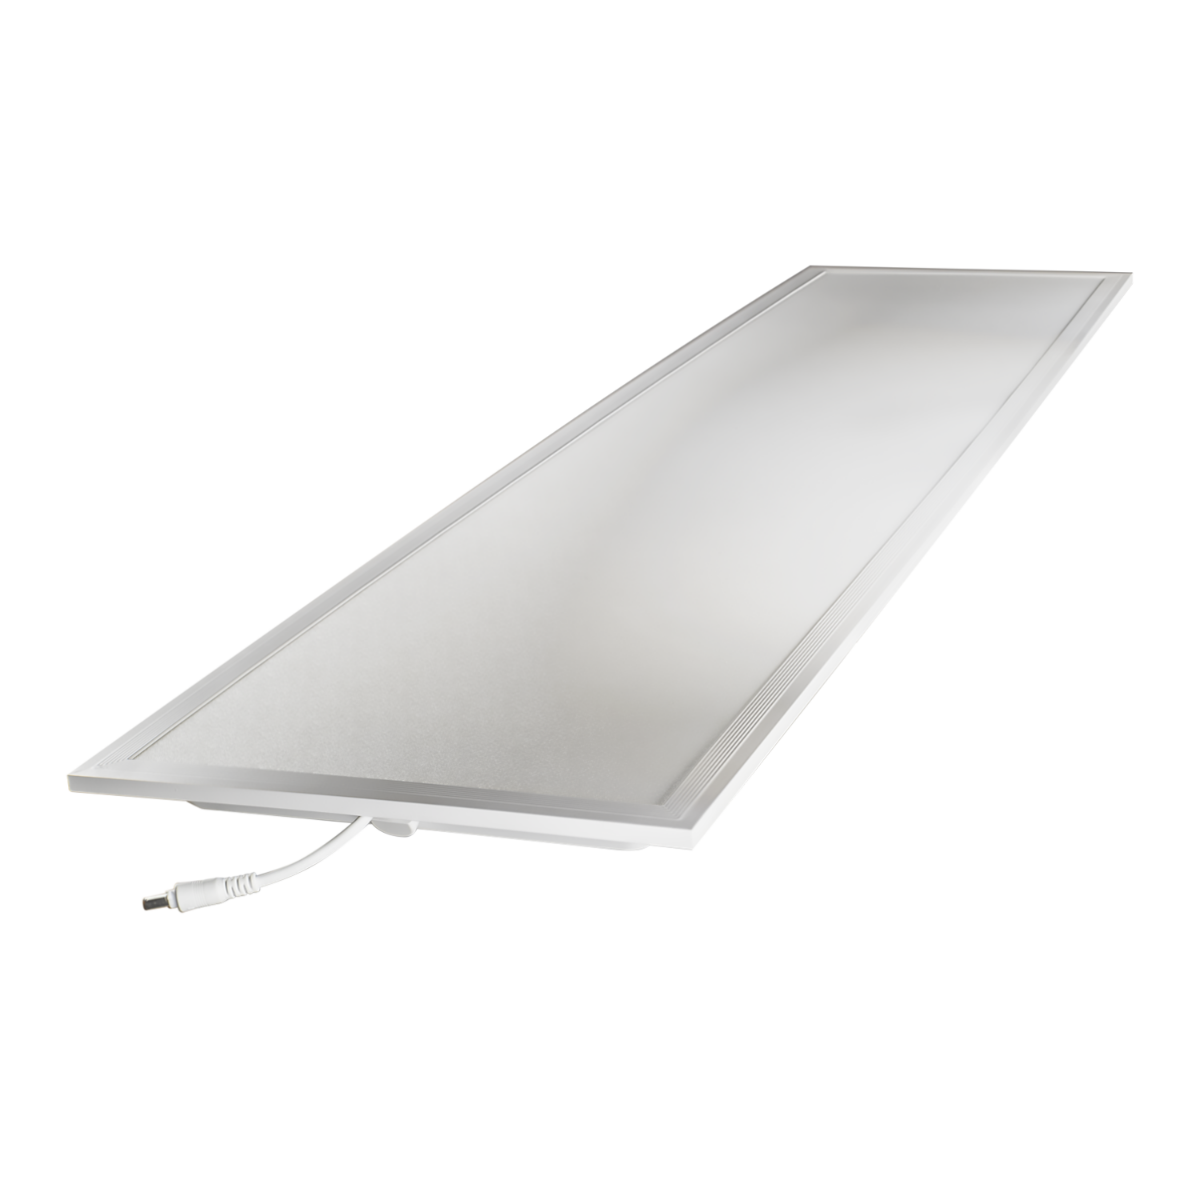 Noxion Panel LED Delta Pro Highlum V2.0 40W 30x120cm 4000K 5480lm UGR <19 | Blanco Frio - Reemplazo 2x36W